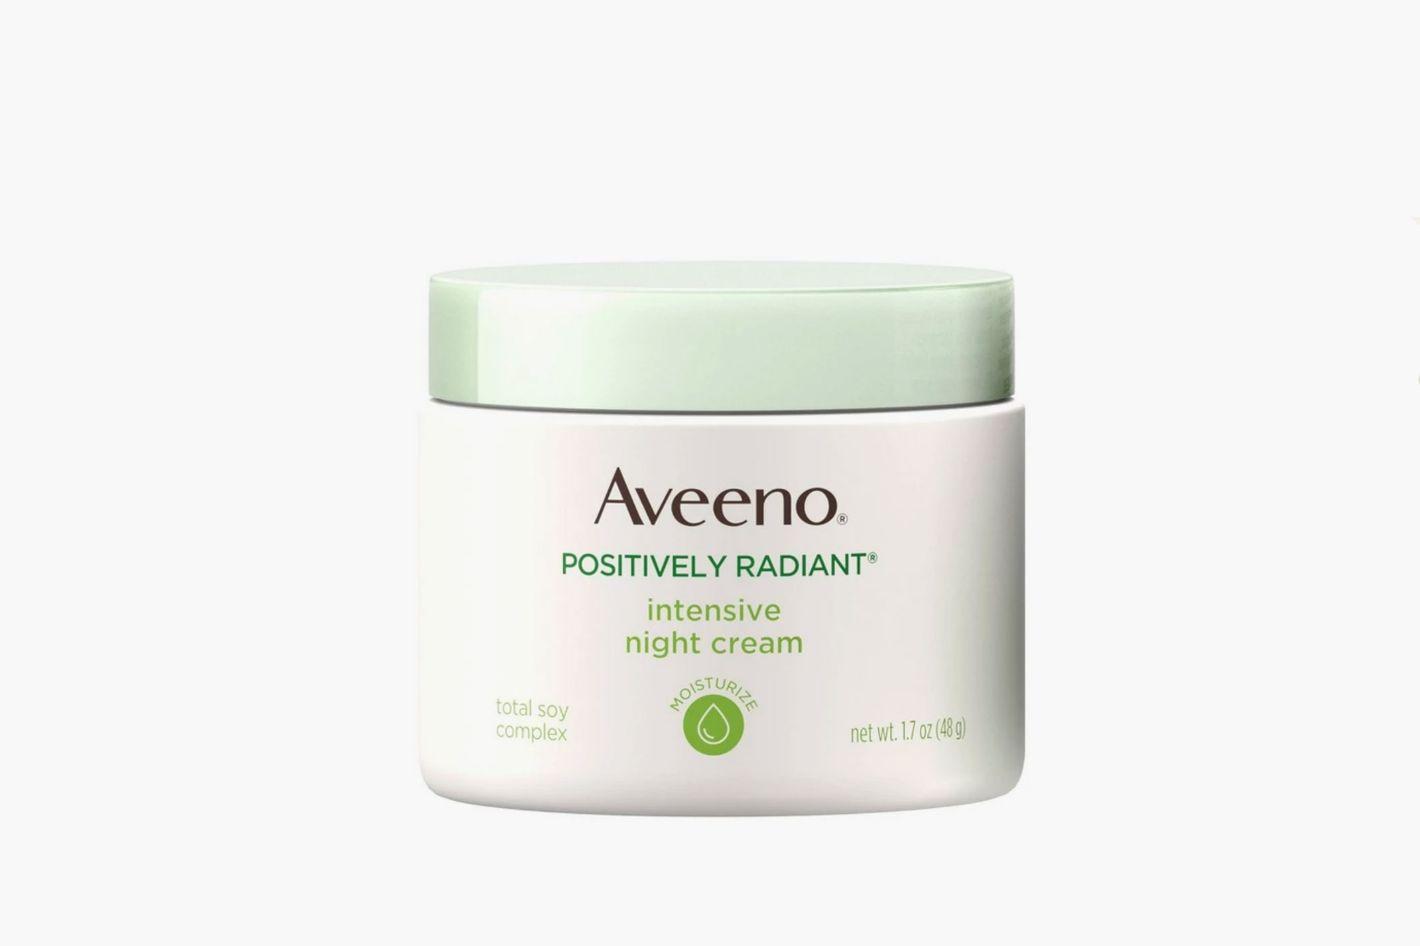 Aveeno Positively Radiant Intensive Night Cream With Vitamin B3